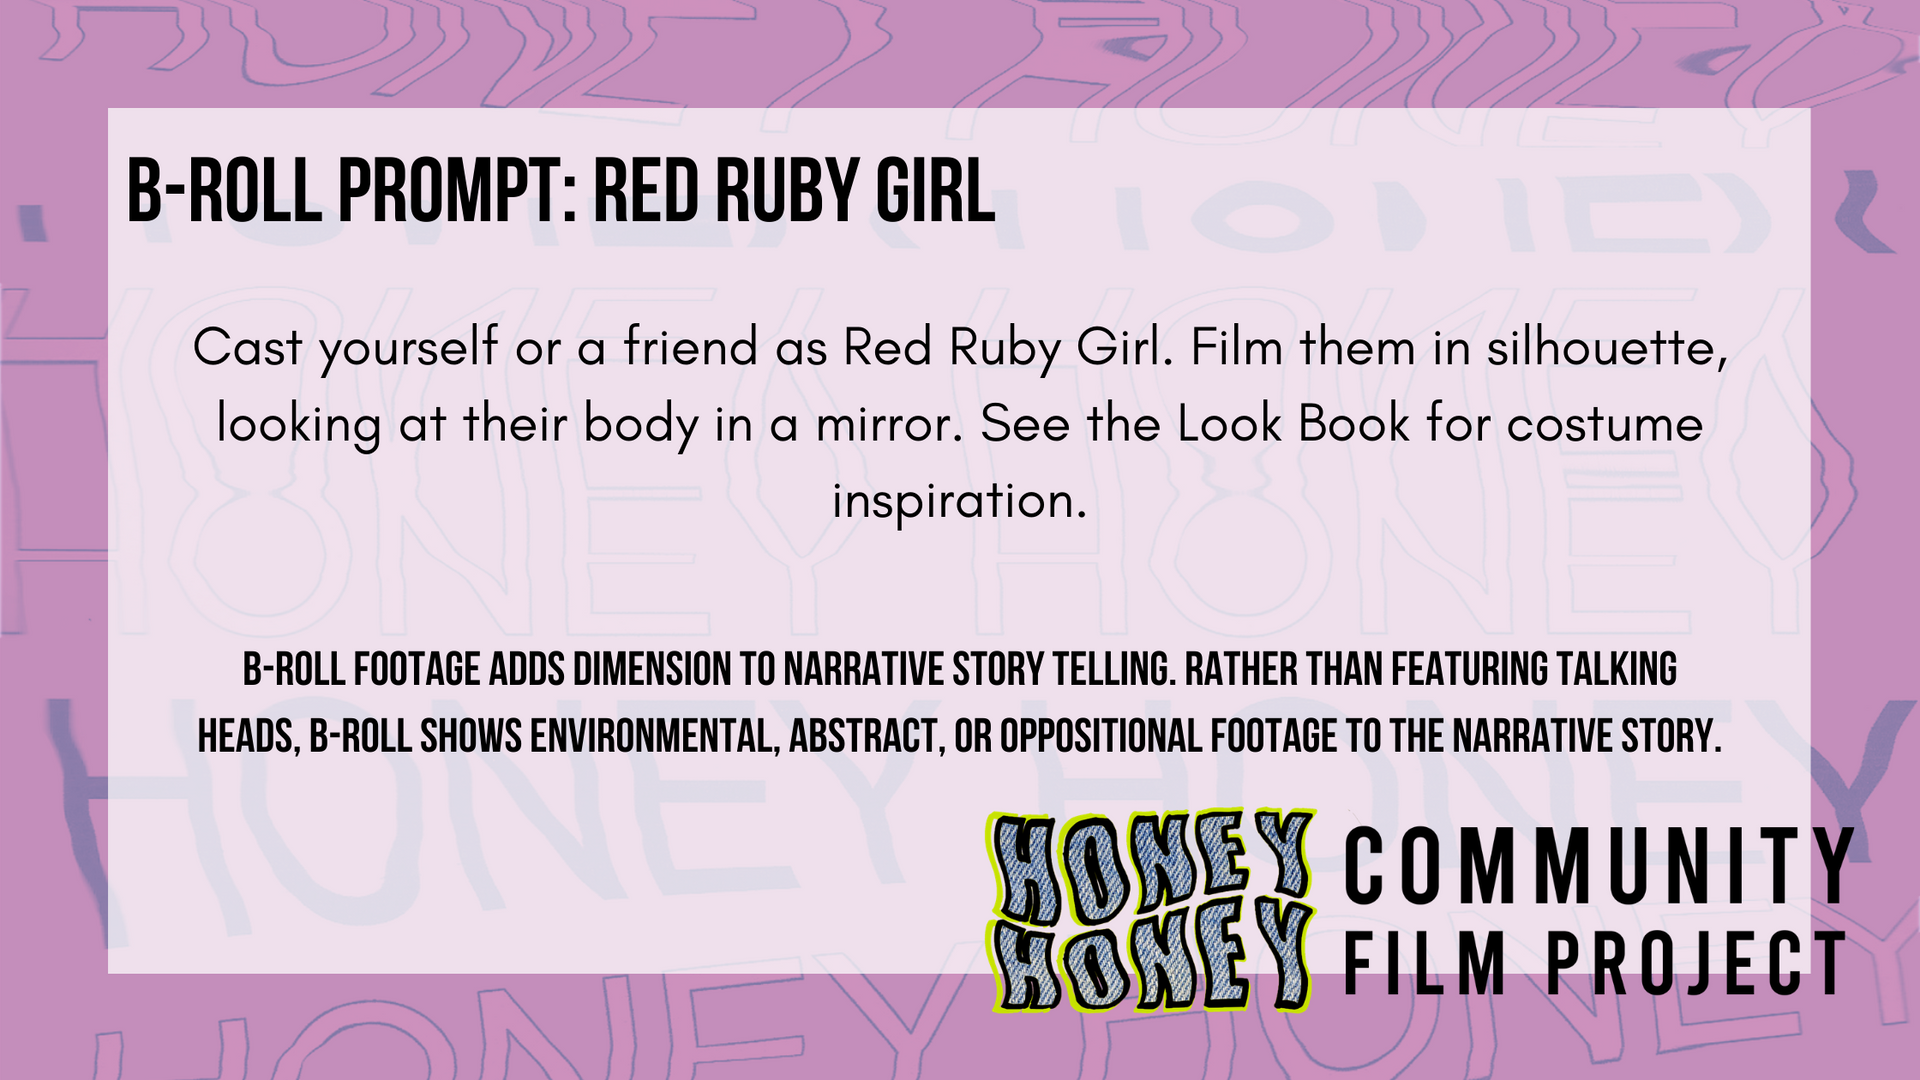 Red Ruby Girl